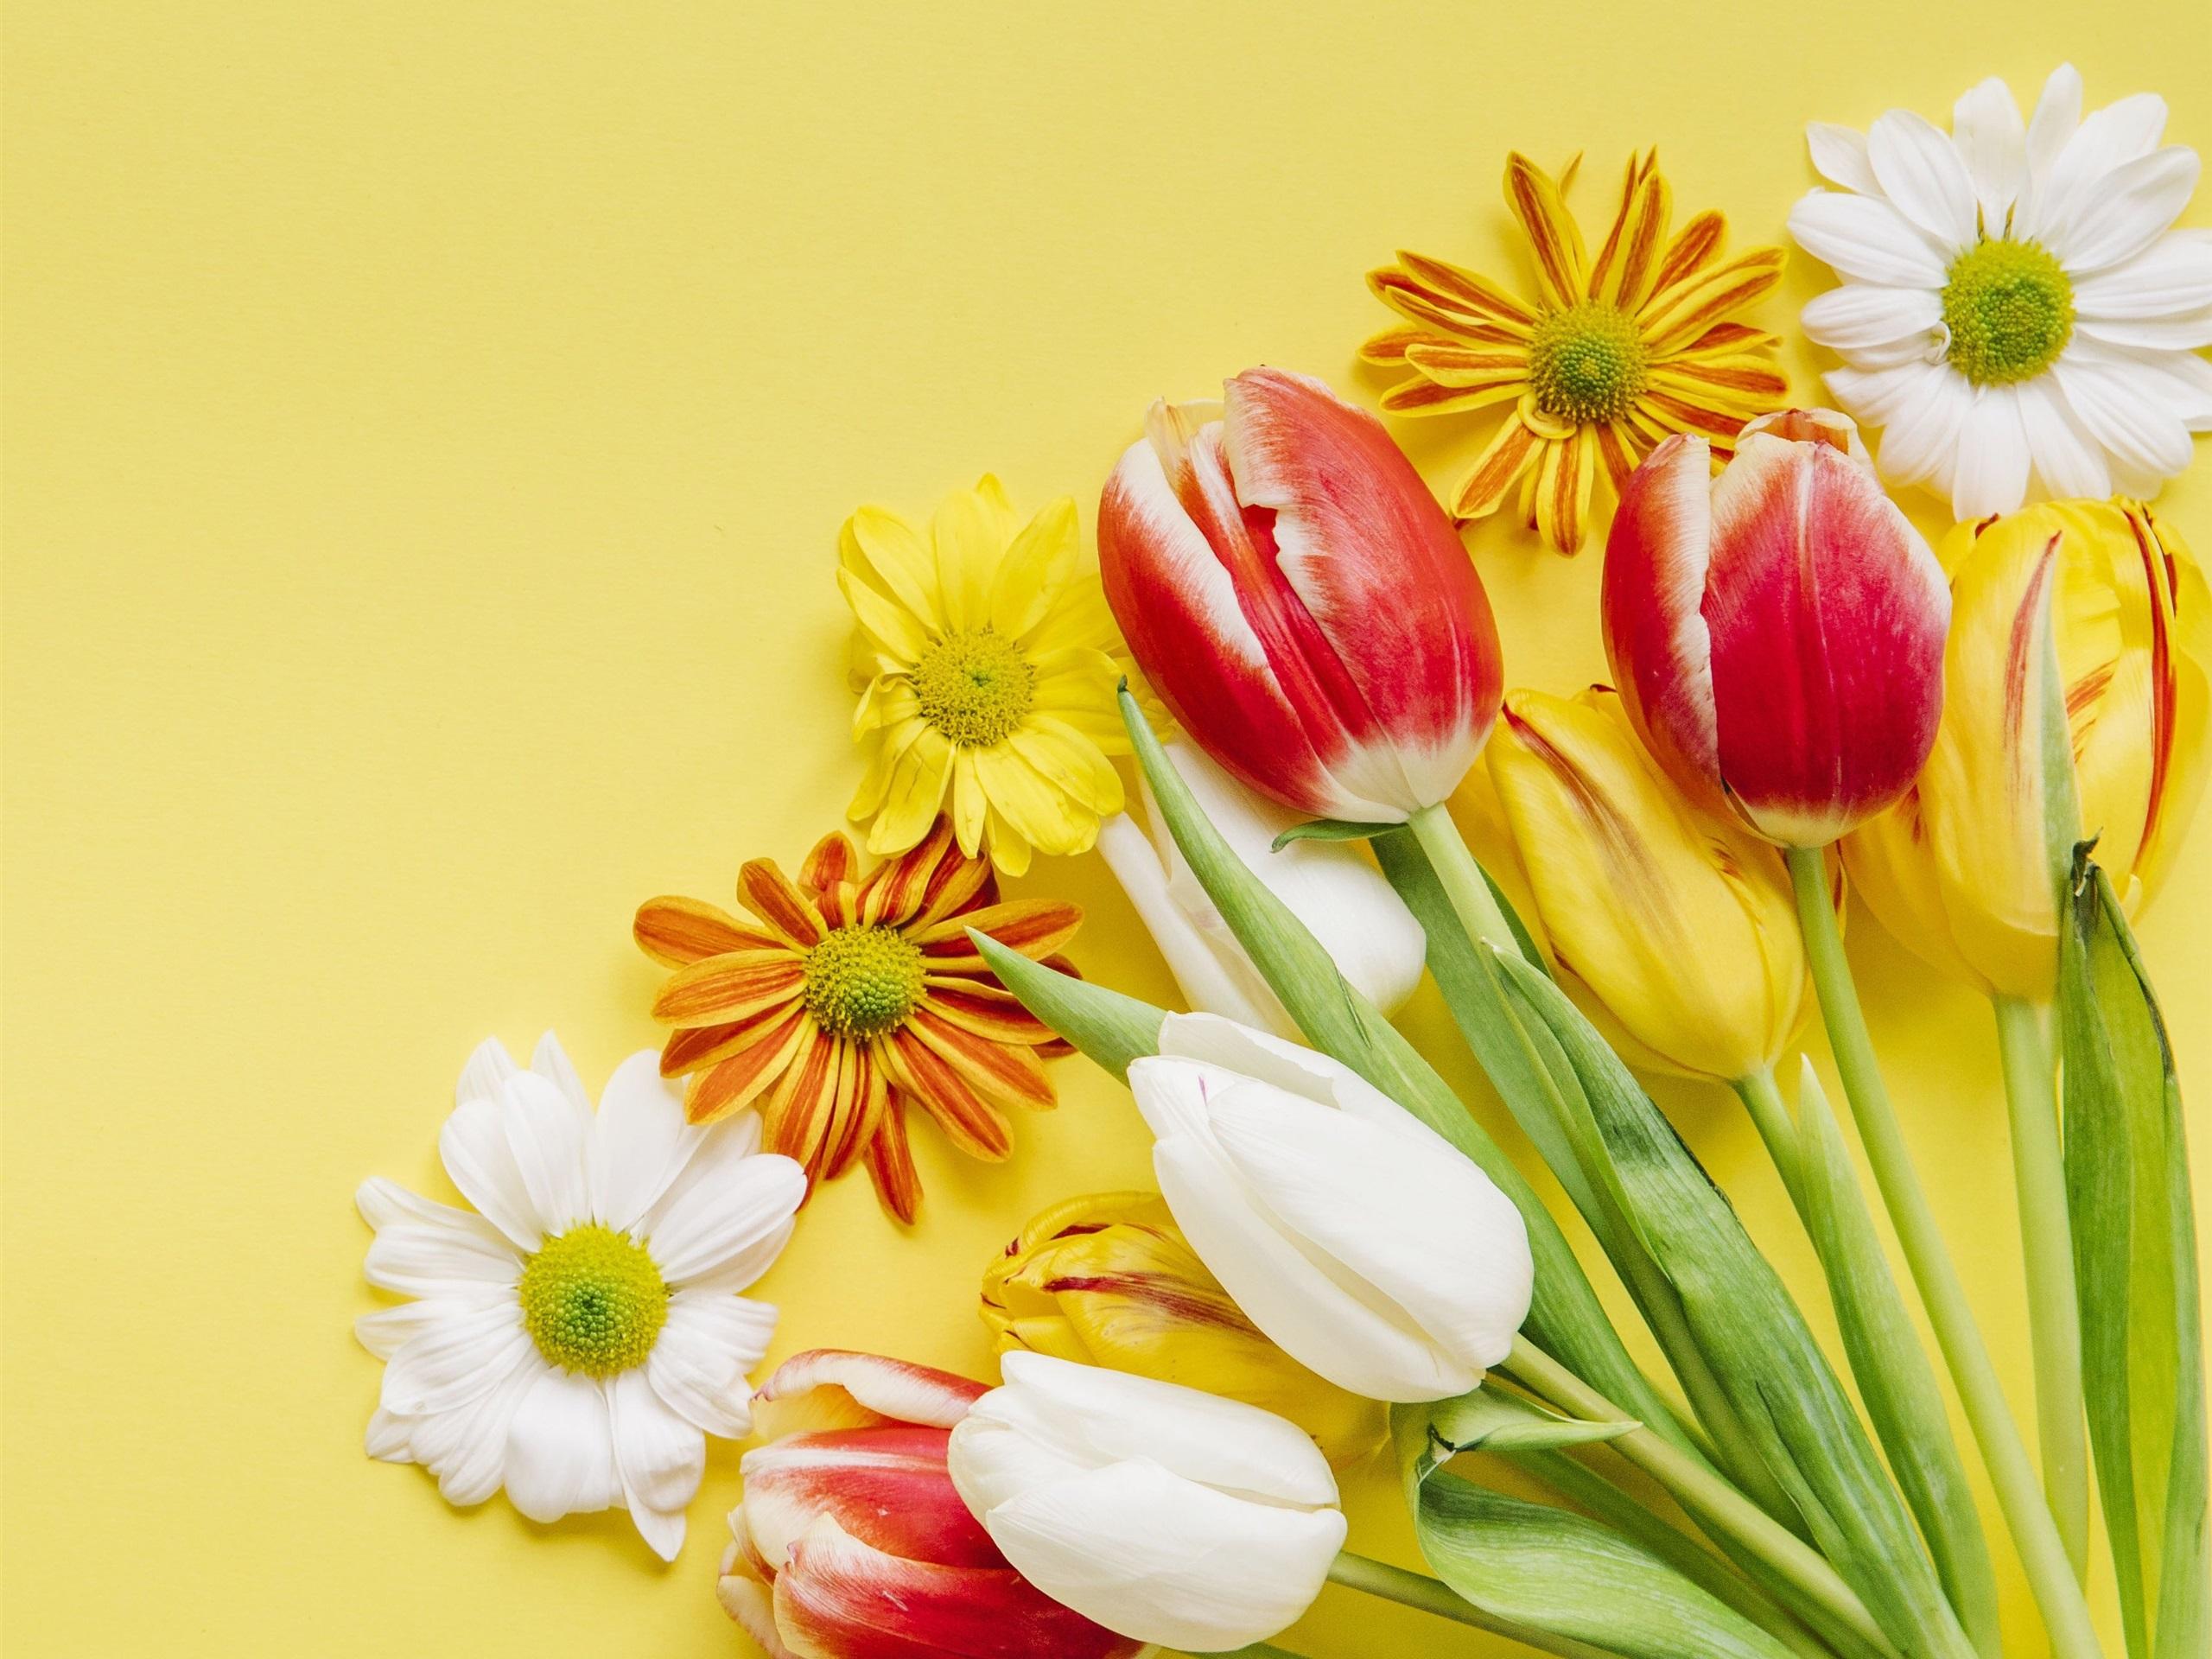 Wallpaper Red Yellow White Flowers Tulips Daisy 2880x1800 Hd